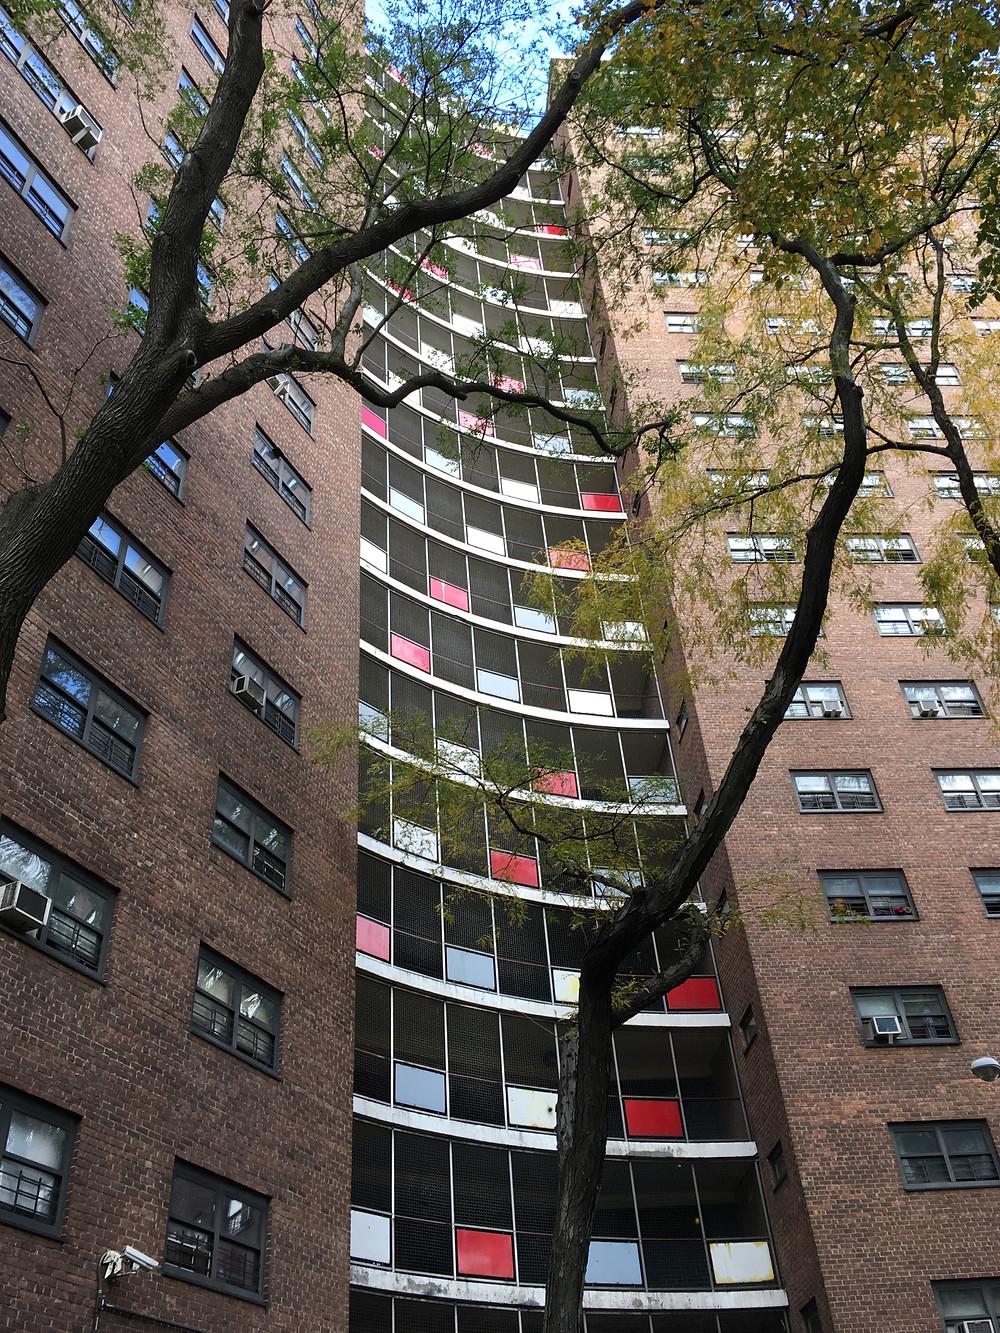 Manhattanville Houses designed by William Lescaze